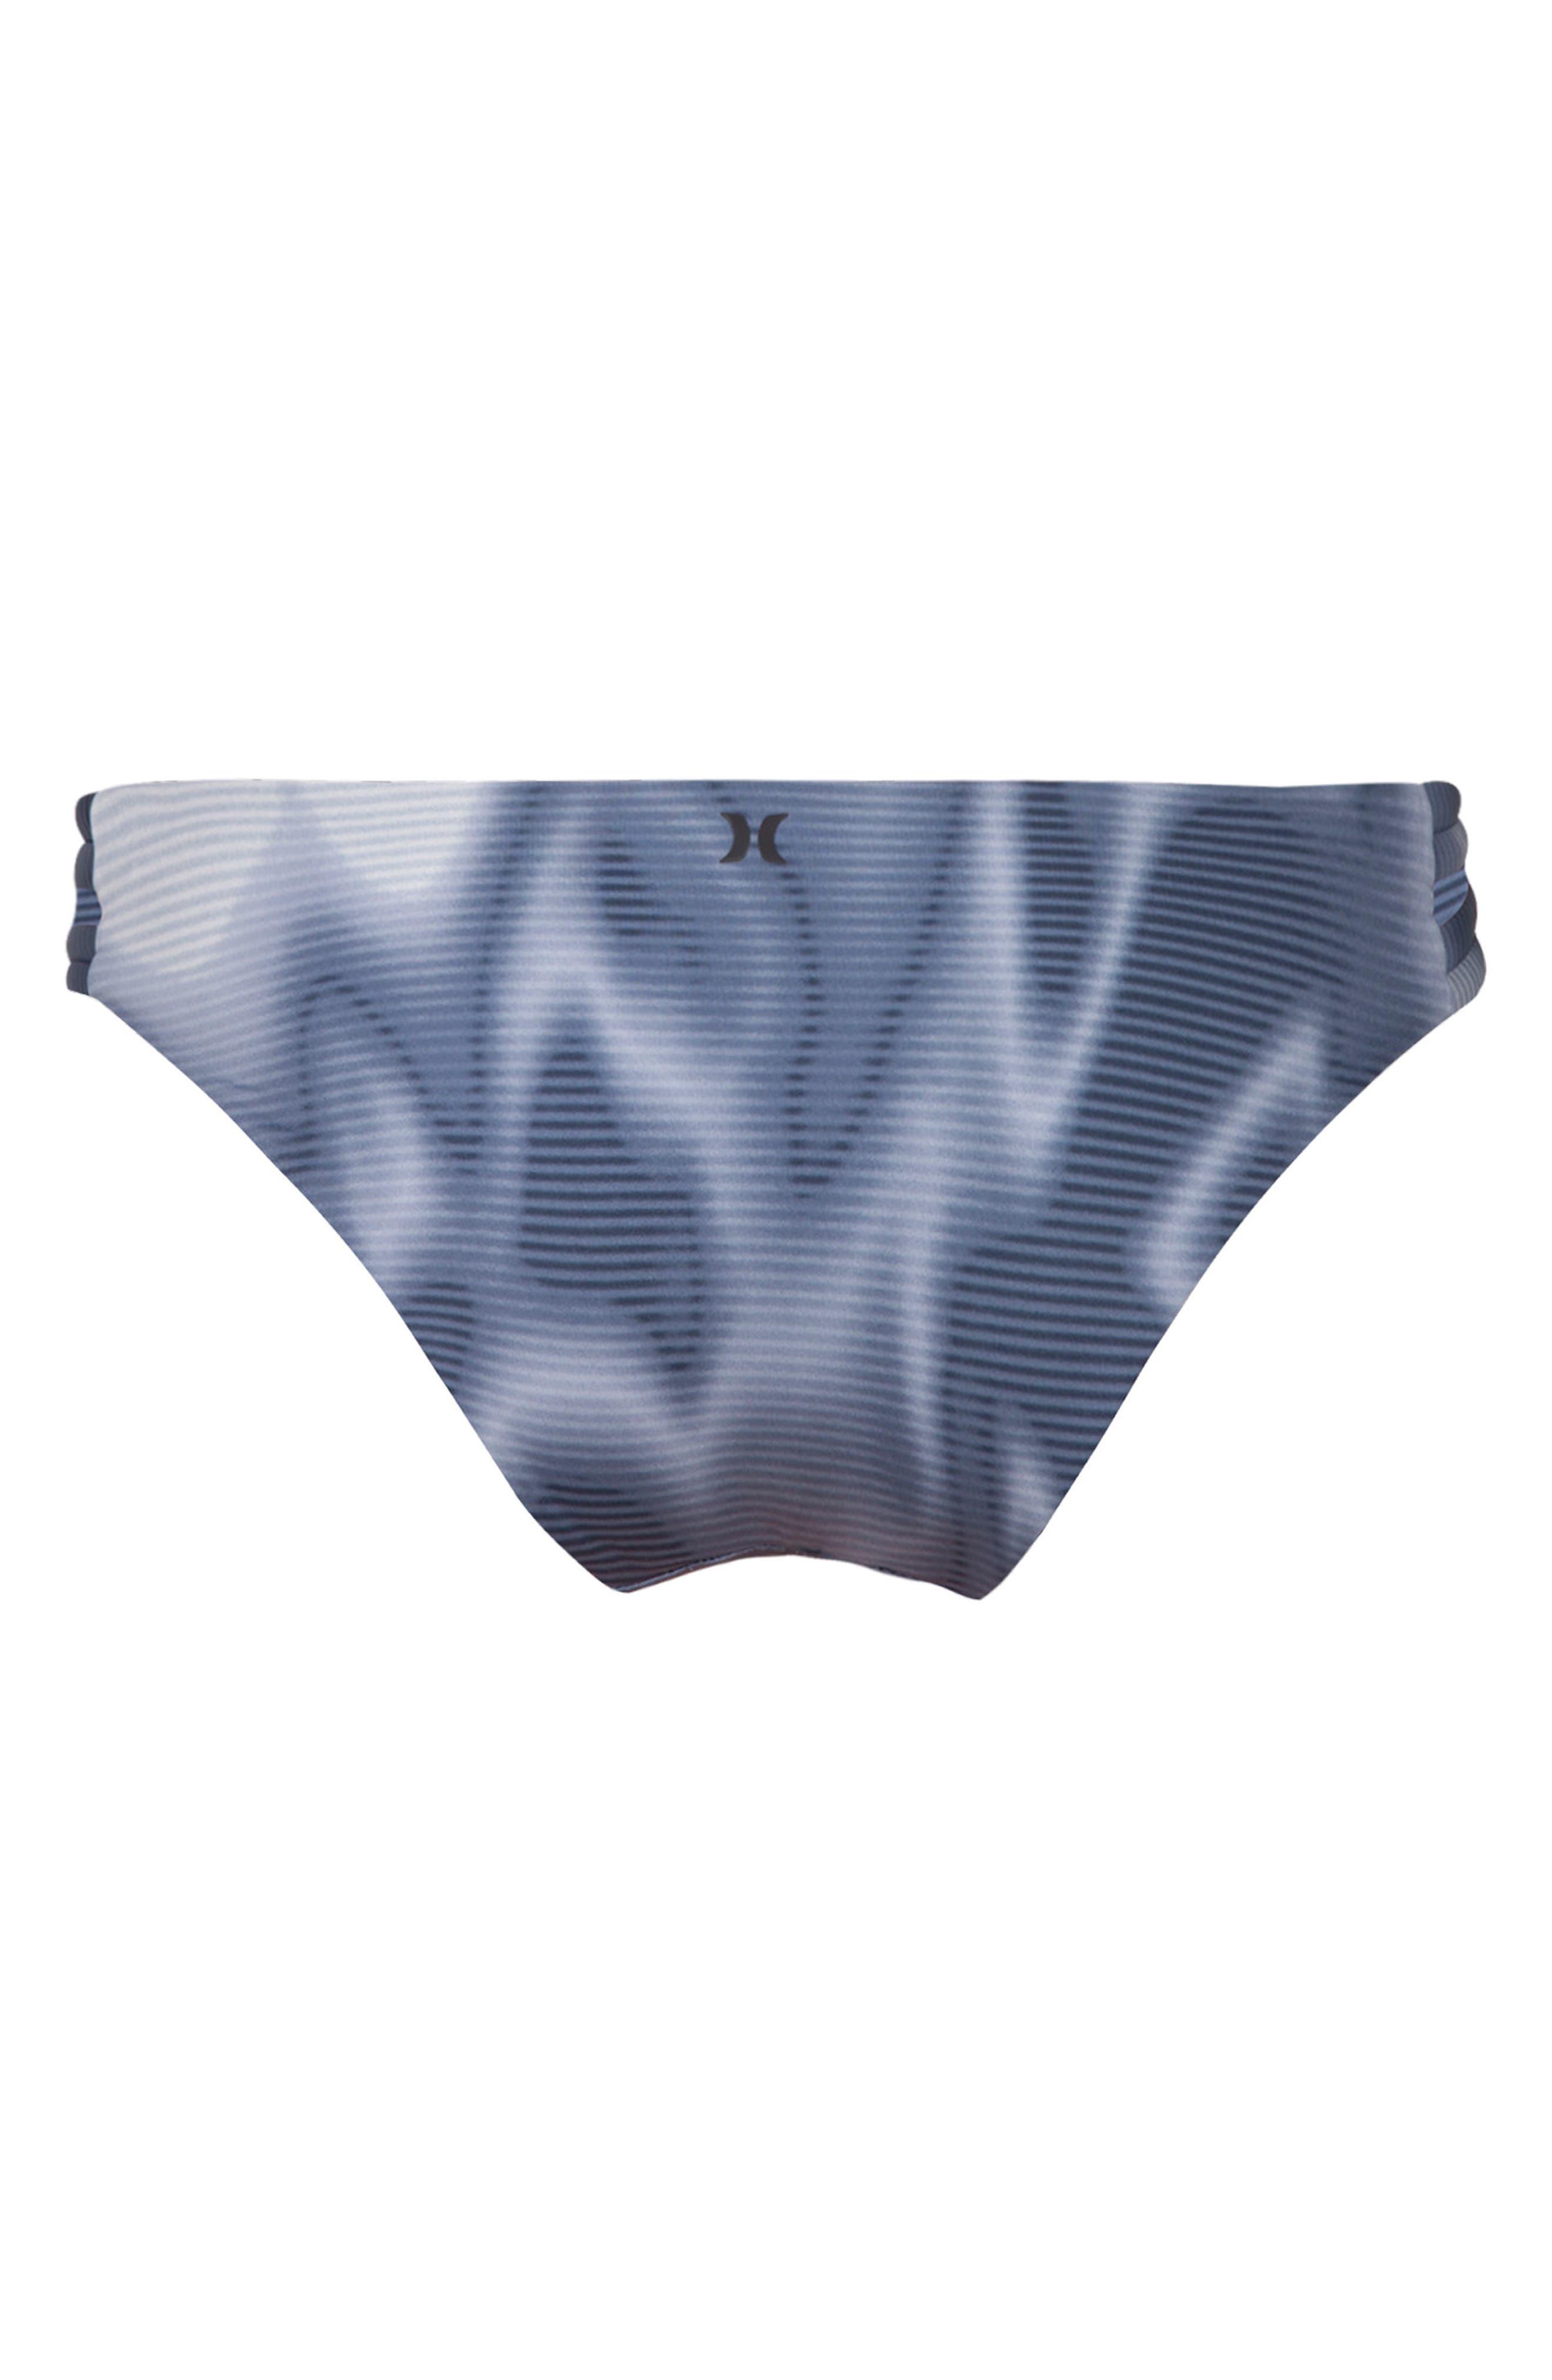 Quick Dry Max Waves Bikini Bottoms,                             Alternate thumbnail 10, color,                             400